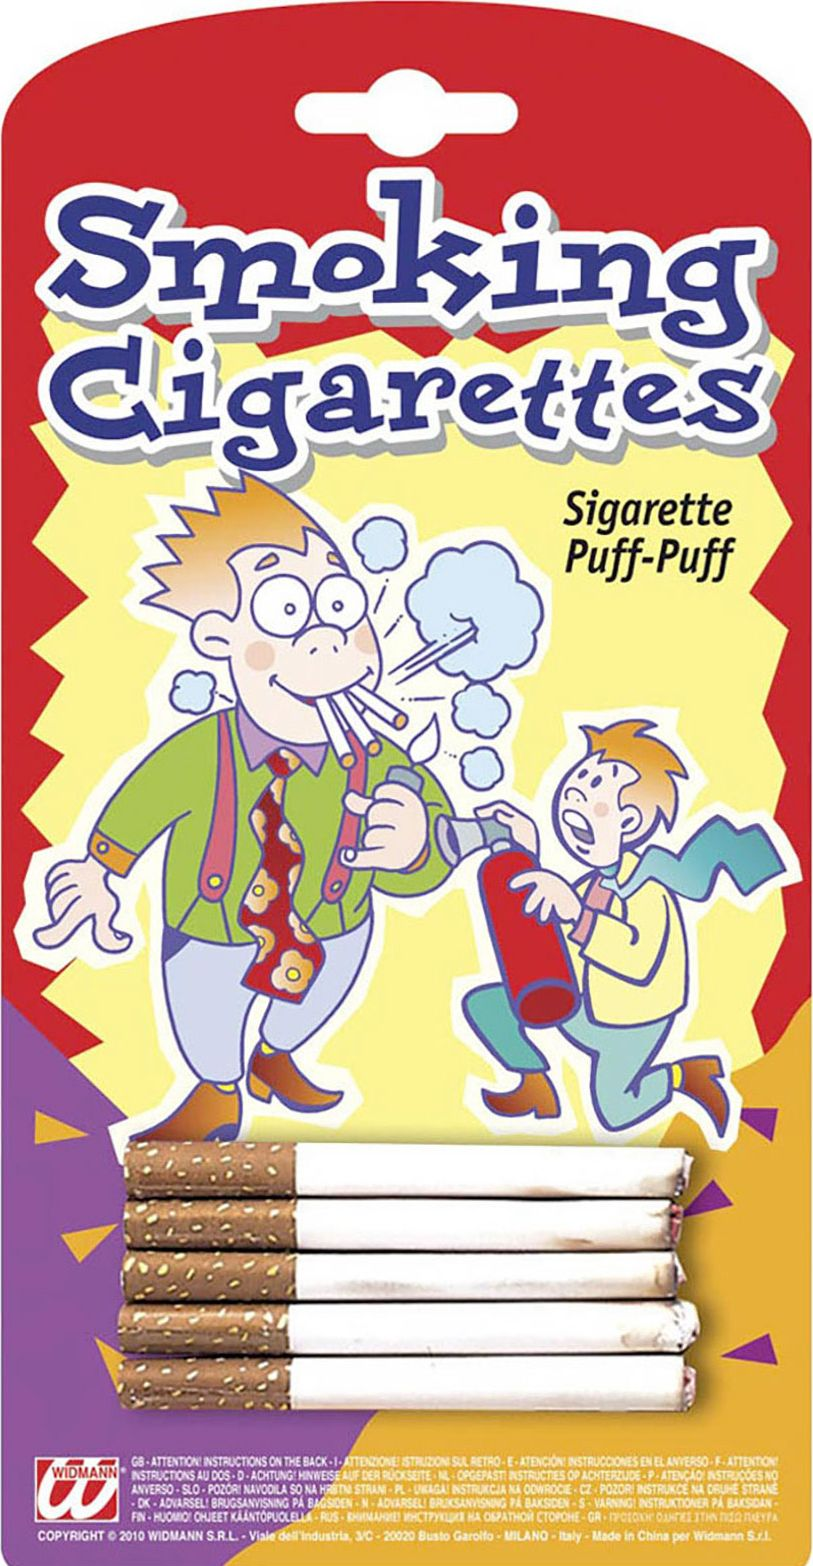 Neppe sigaretten